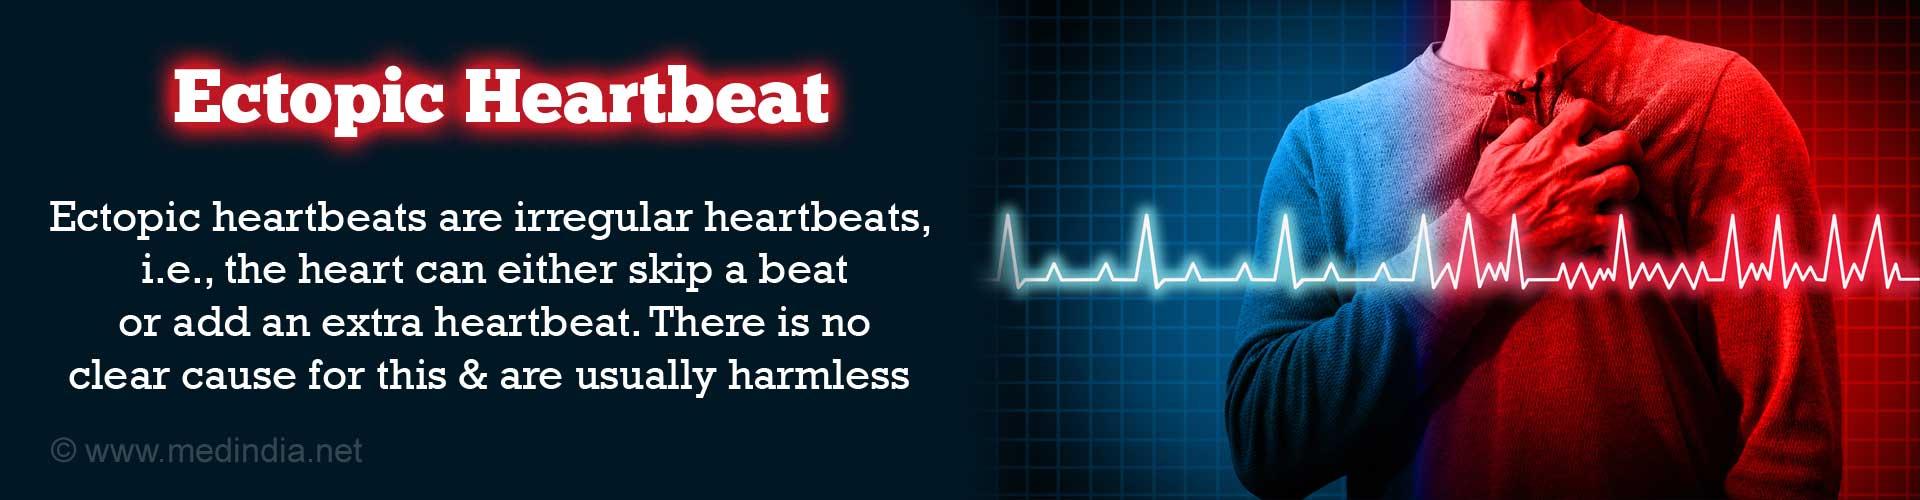 Ectopic Heartbeat